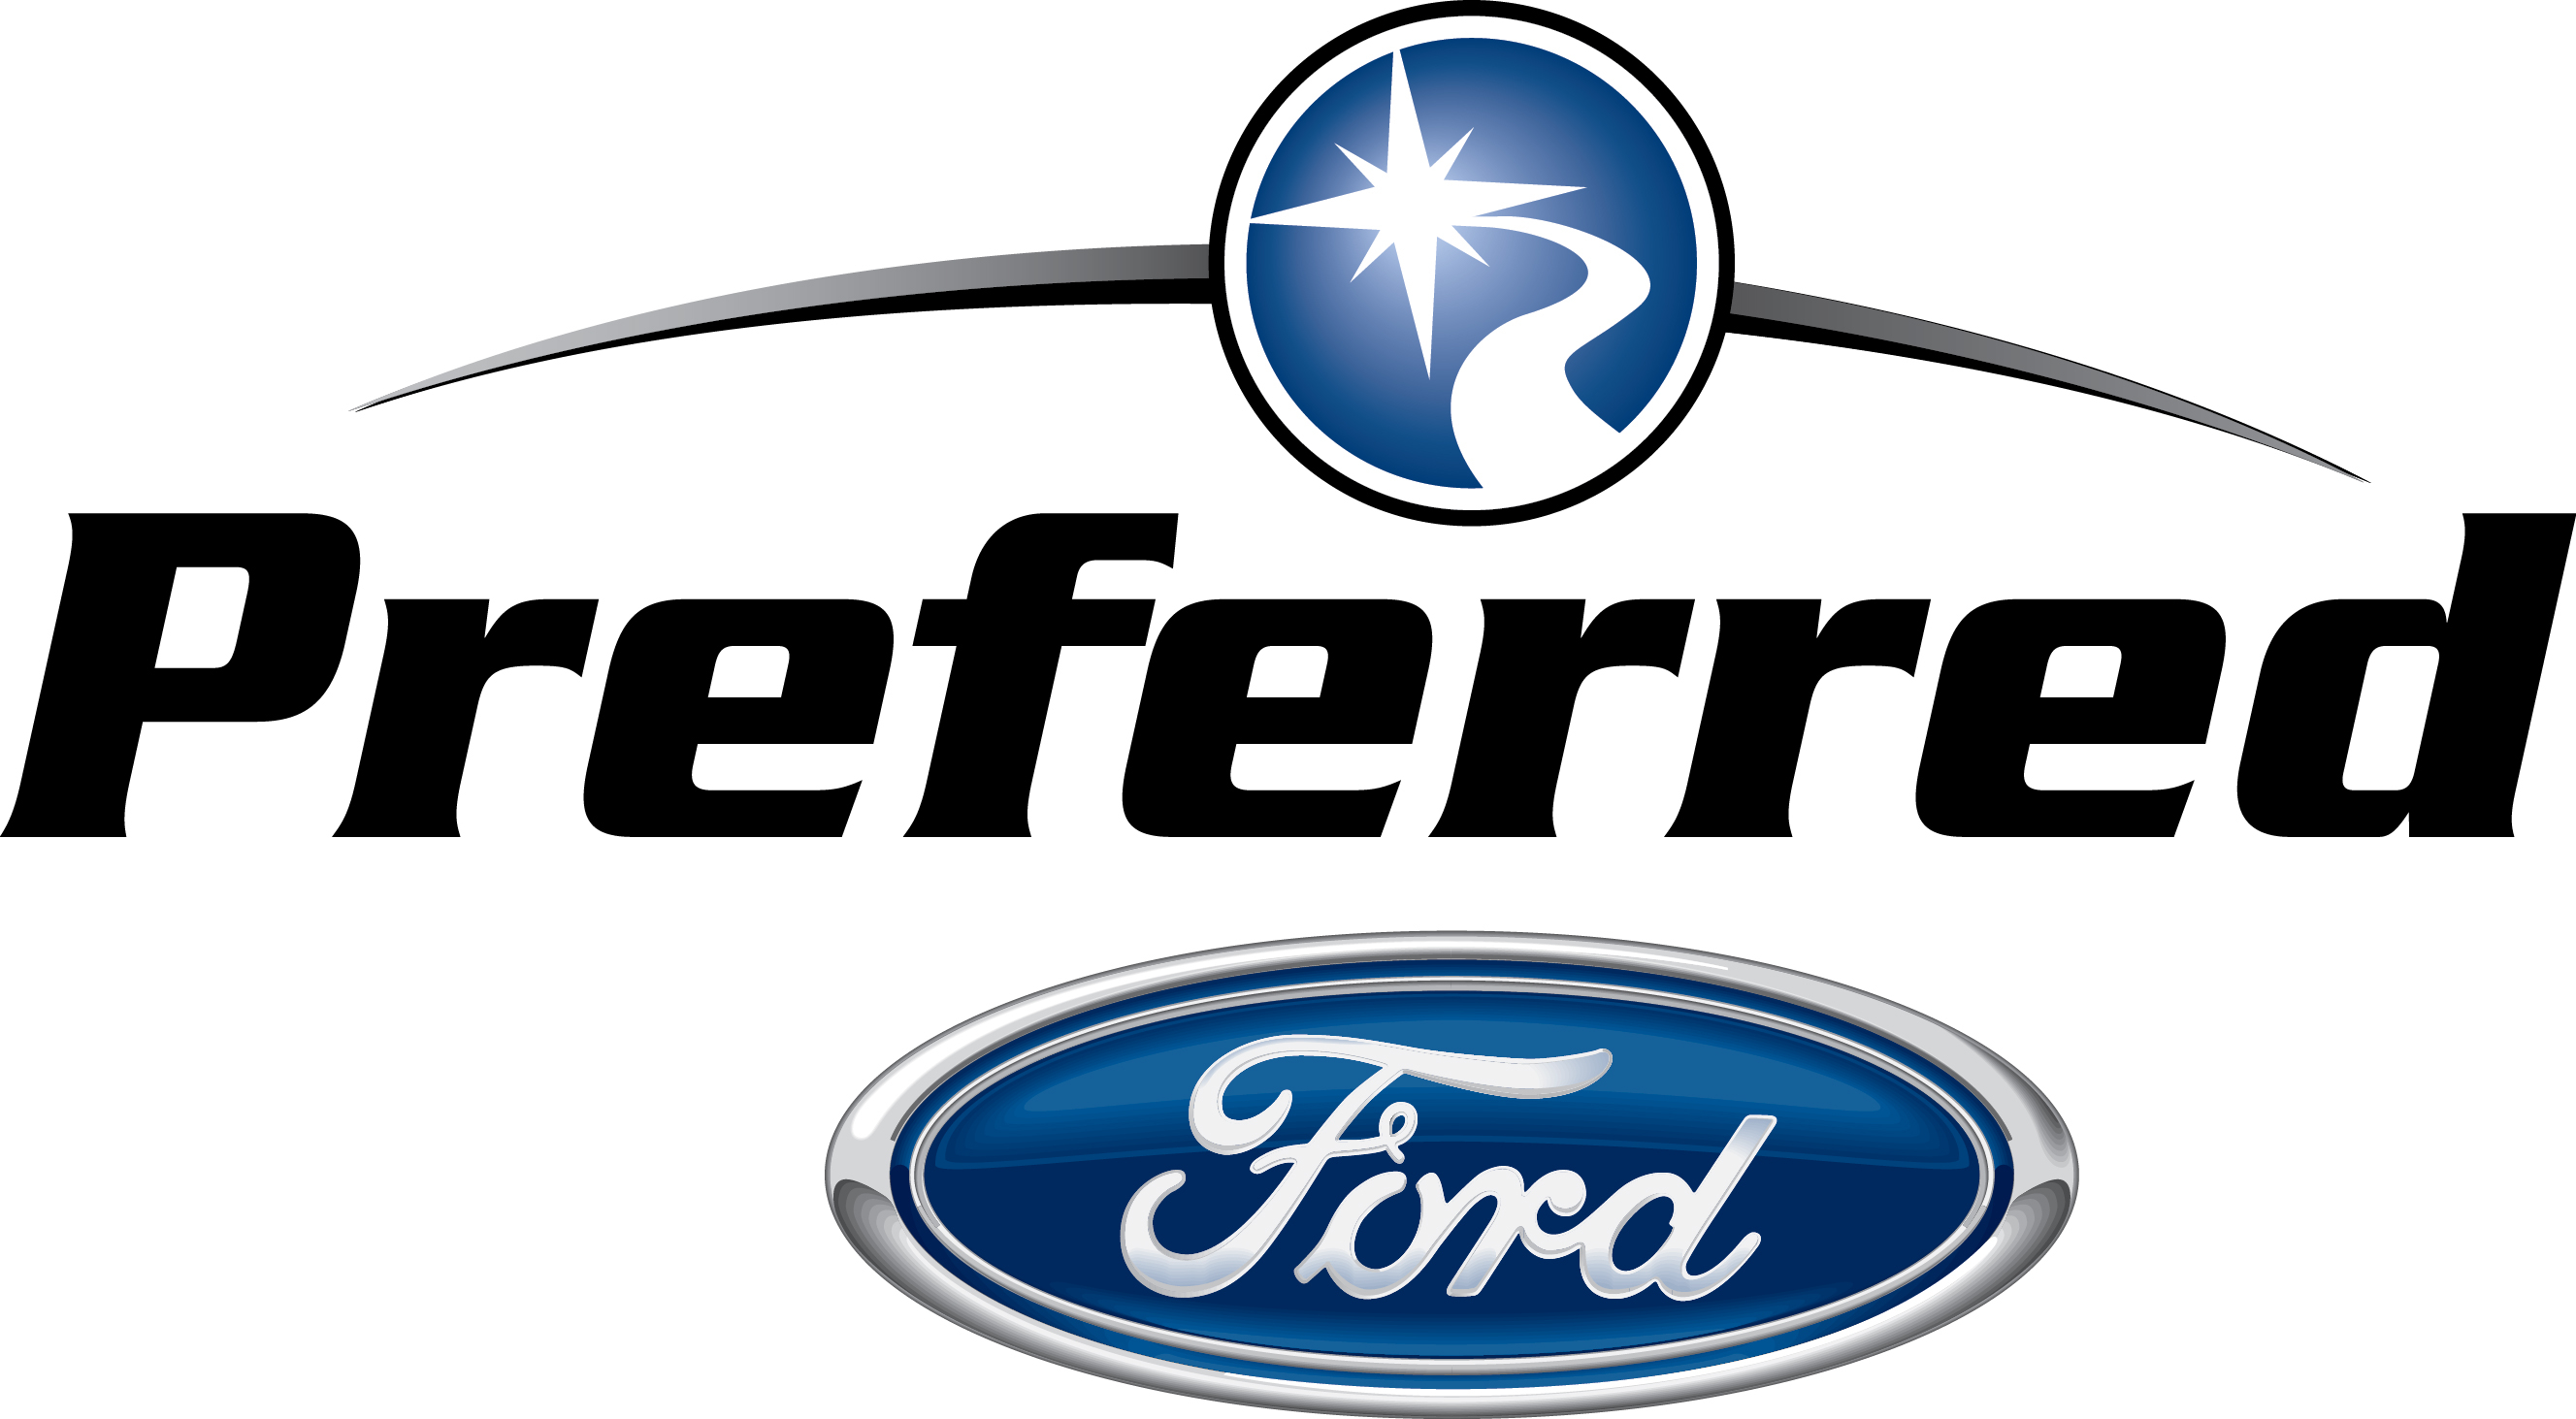 Preferred Ford In Grand Haven Mi Used Cars